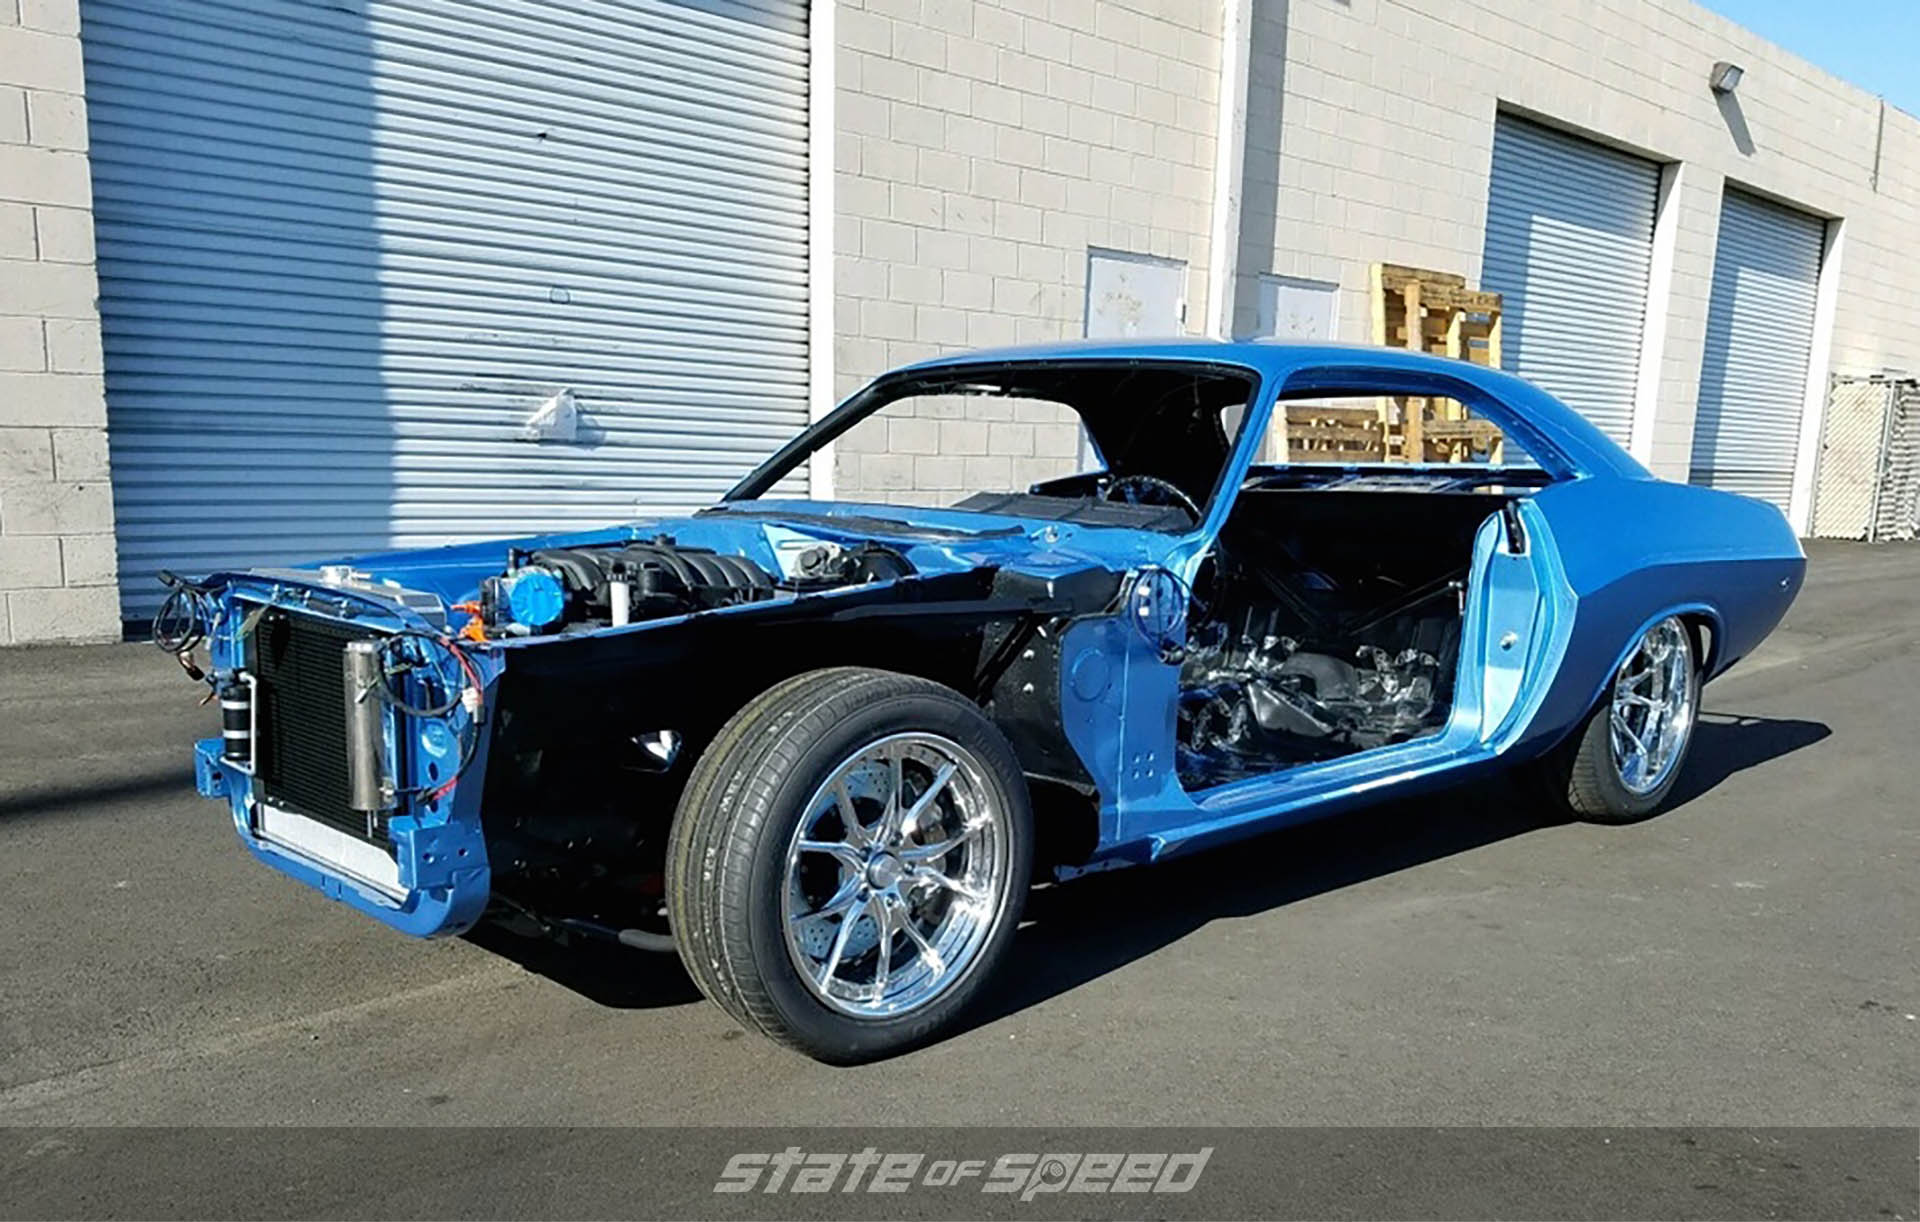 '73 Charles Schwab Challenger Build